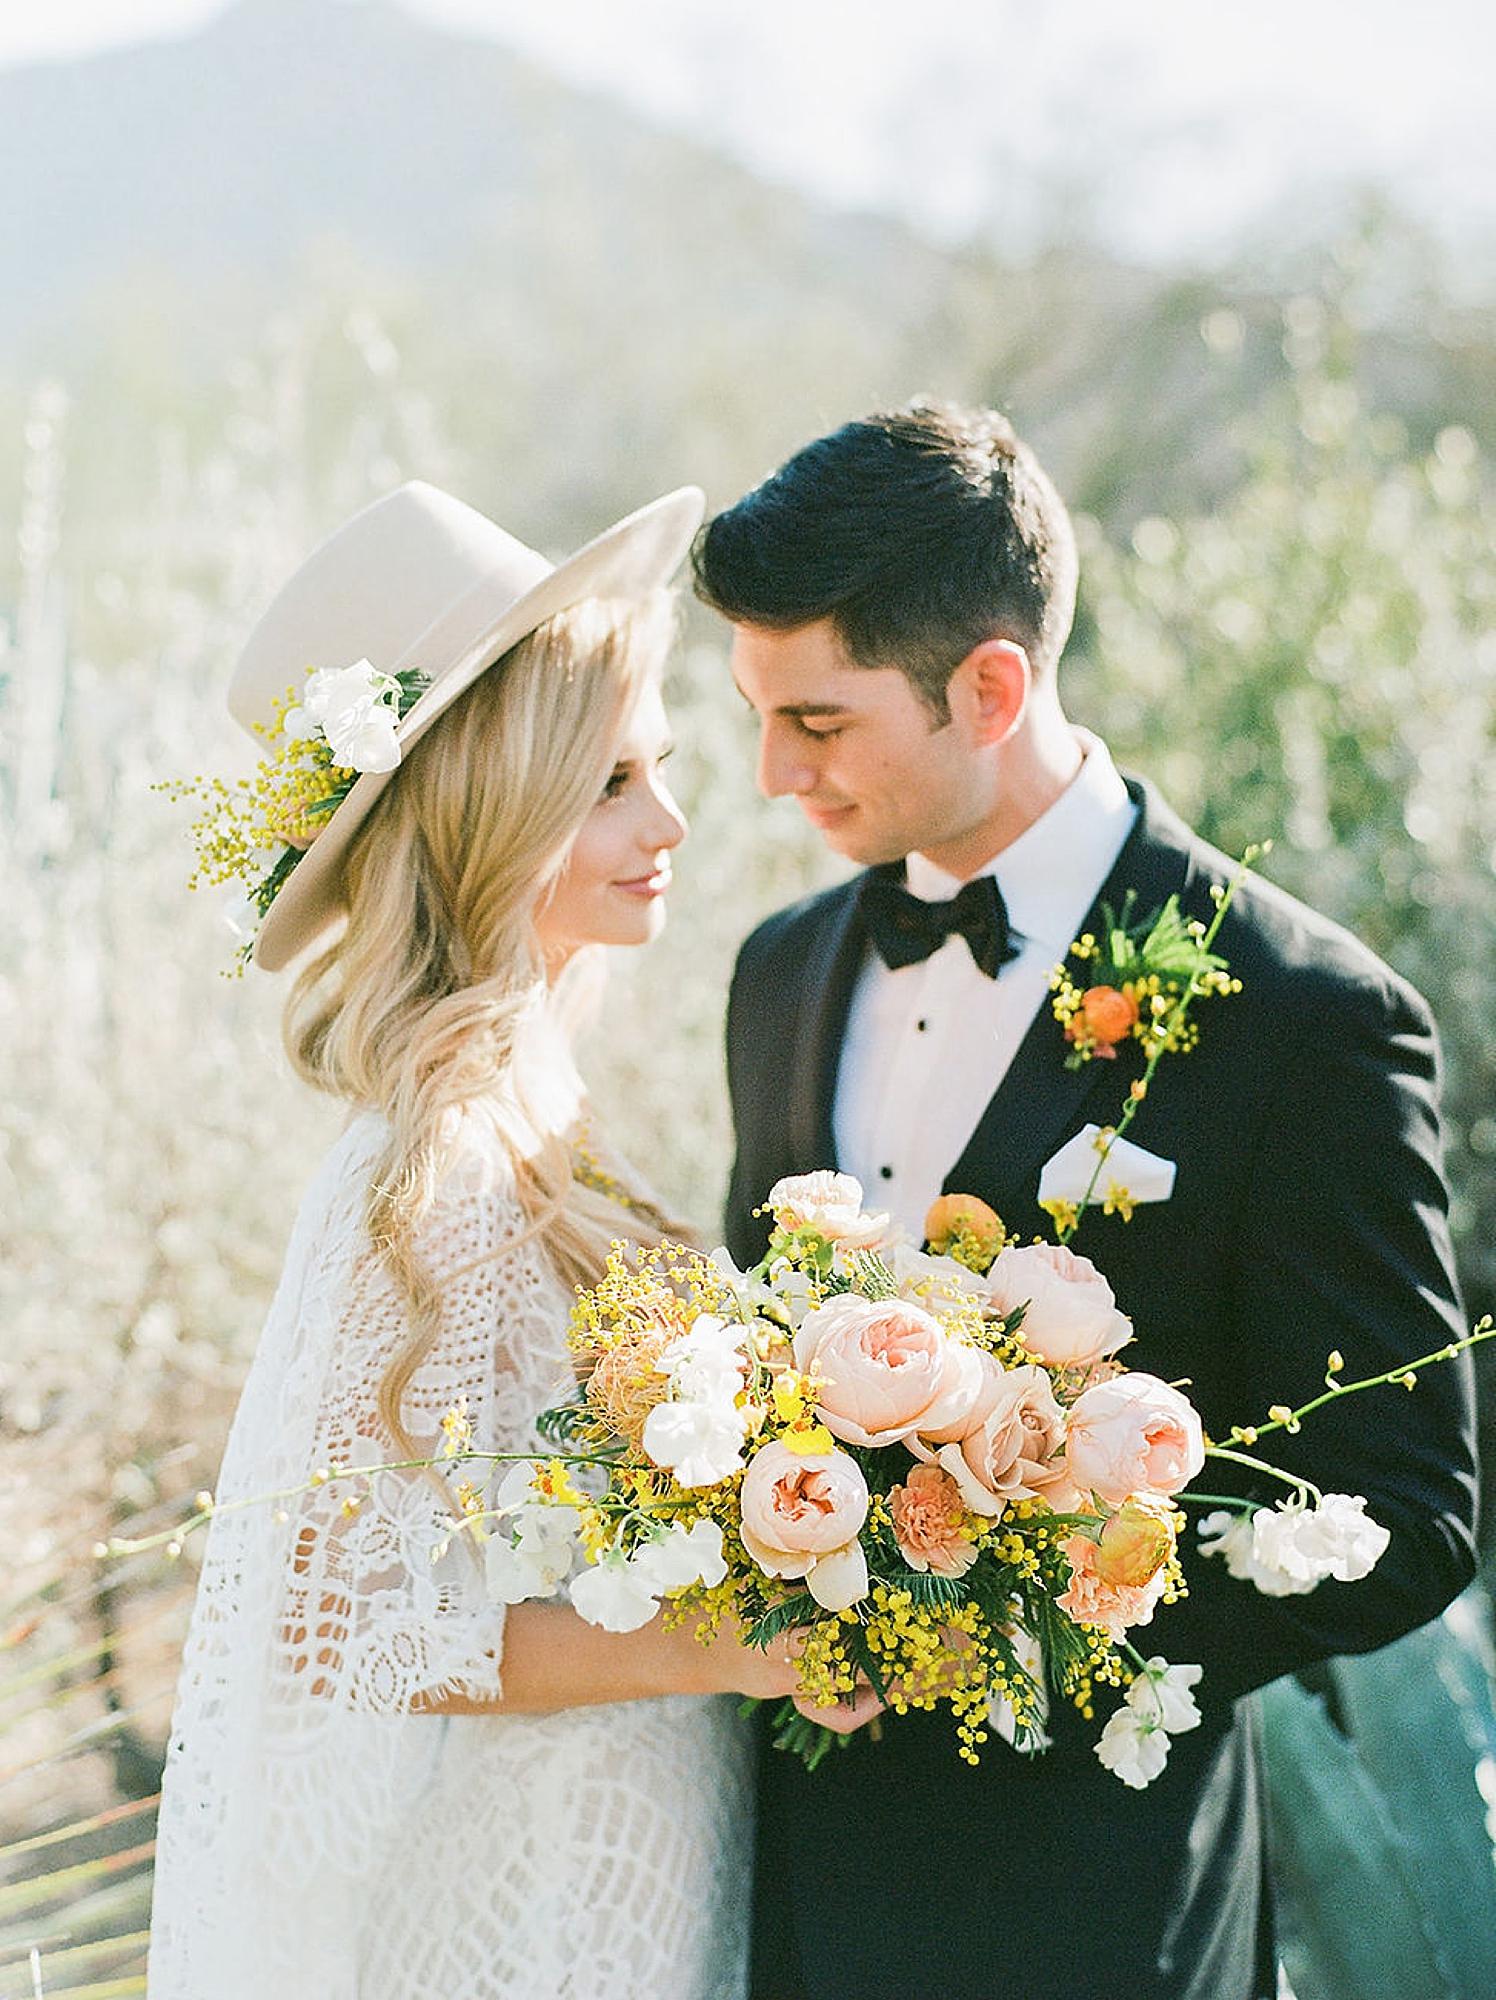 El Chorro Sedona AZ Wedding Photography by Magi Fisher of Magdalena Studios 0039